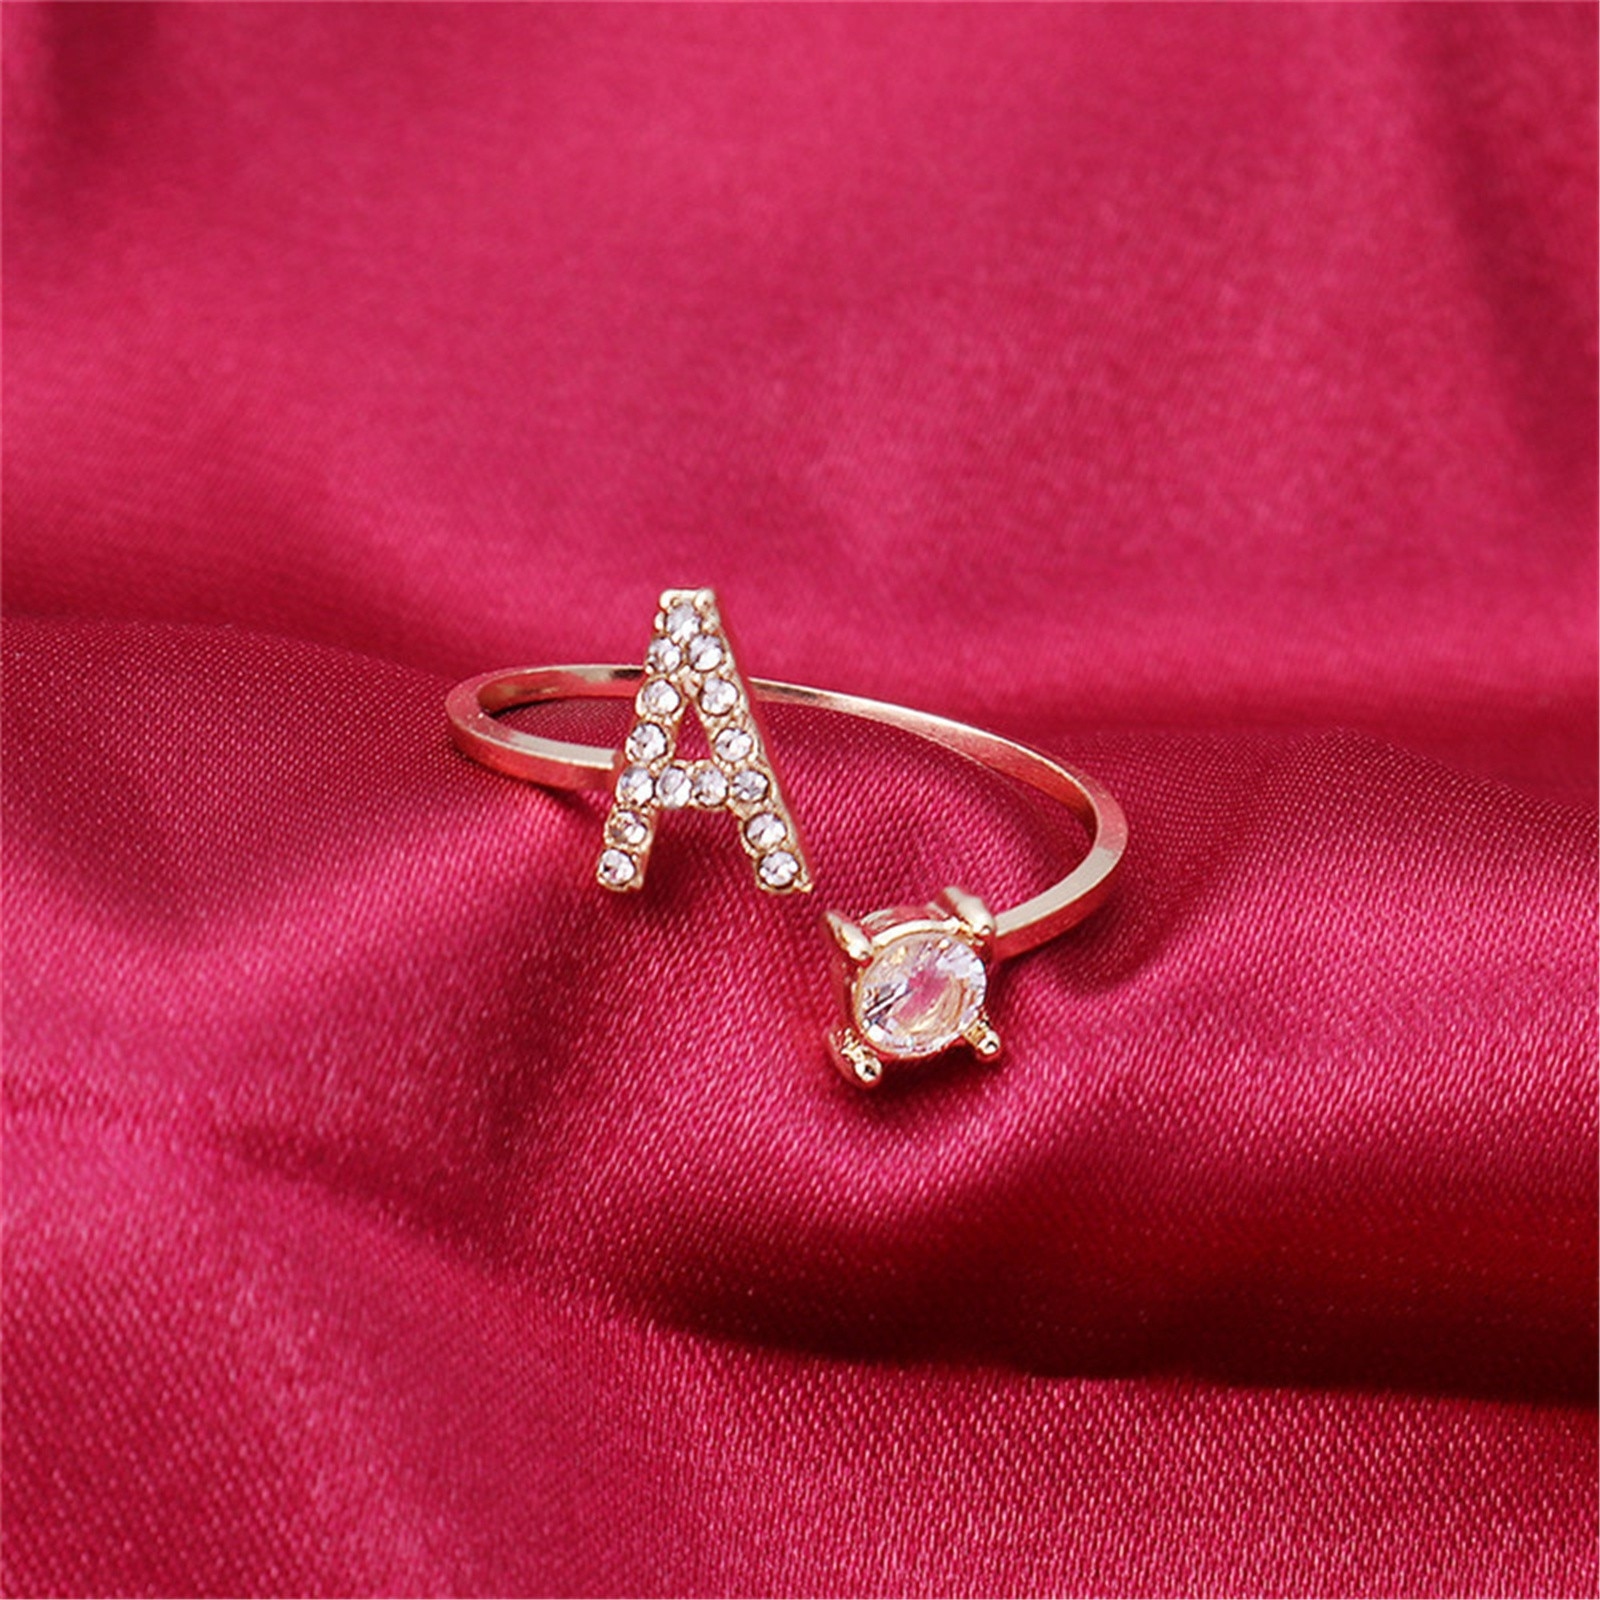 Anillos para mujer estilo alfabeto inglés, anillo ajustable con letras, moda de...